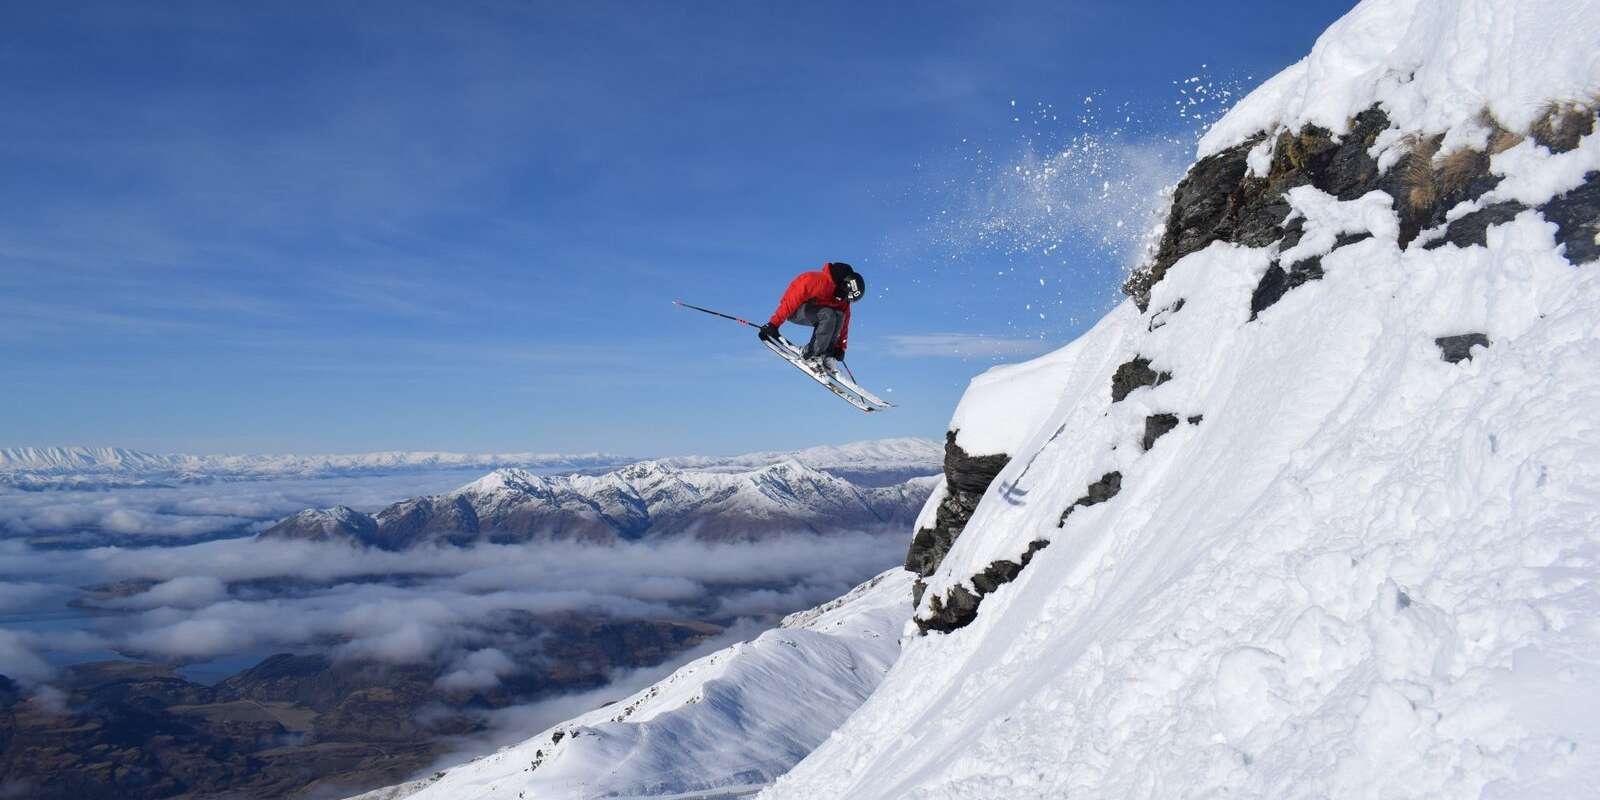 Skiier at Treble Cone